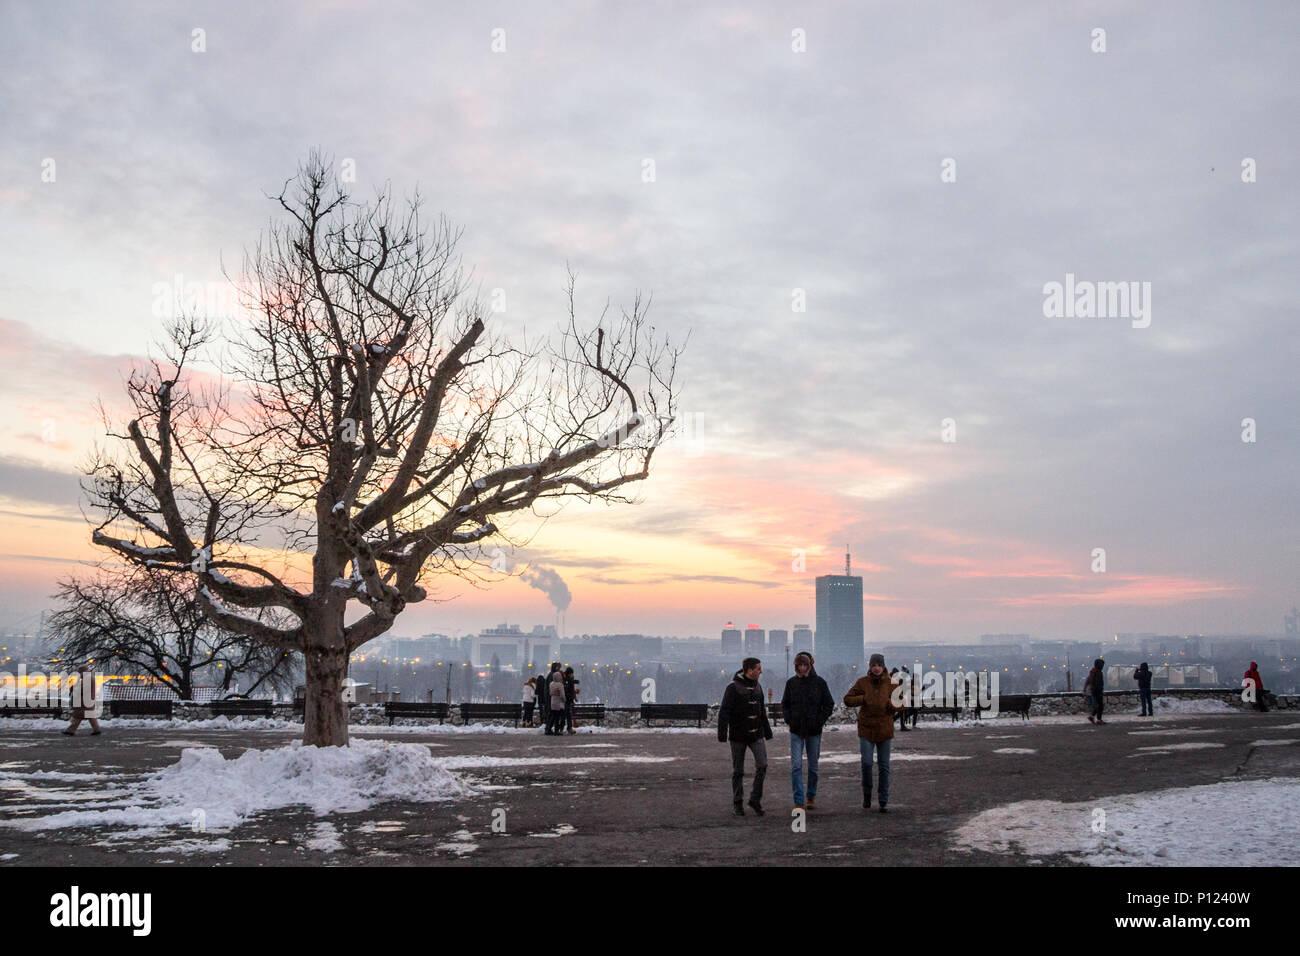 BELGRADE, SERBIA - JANUARY 1, 2015: people walking facing New Belgrade (Novi Beograd) from Kalemegdan fortress, one of the main monuments of Belgrade, - Stock Image